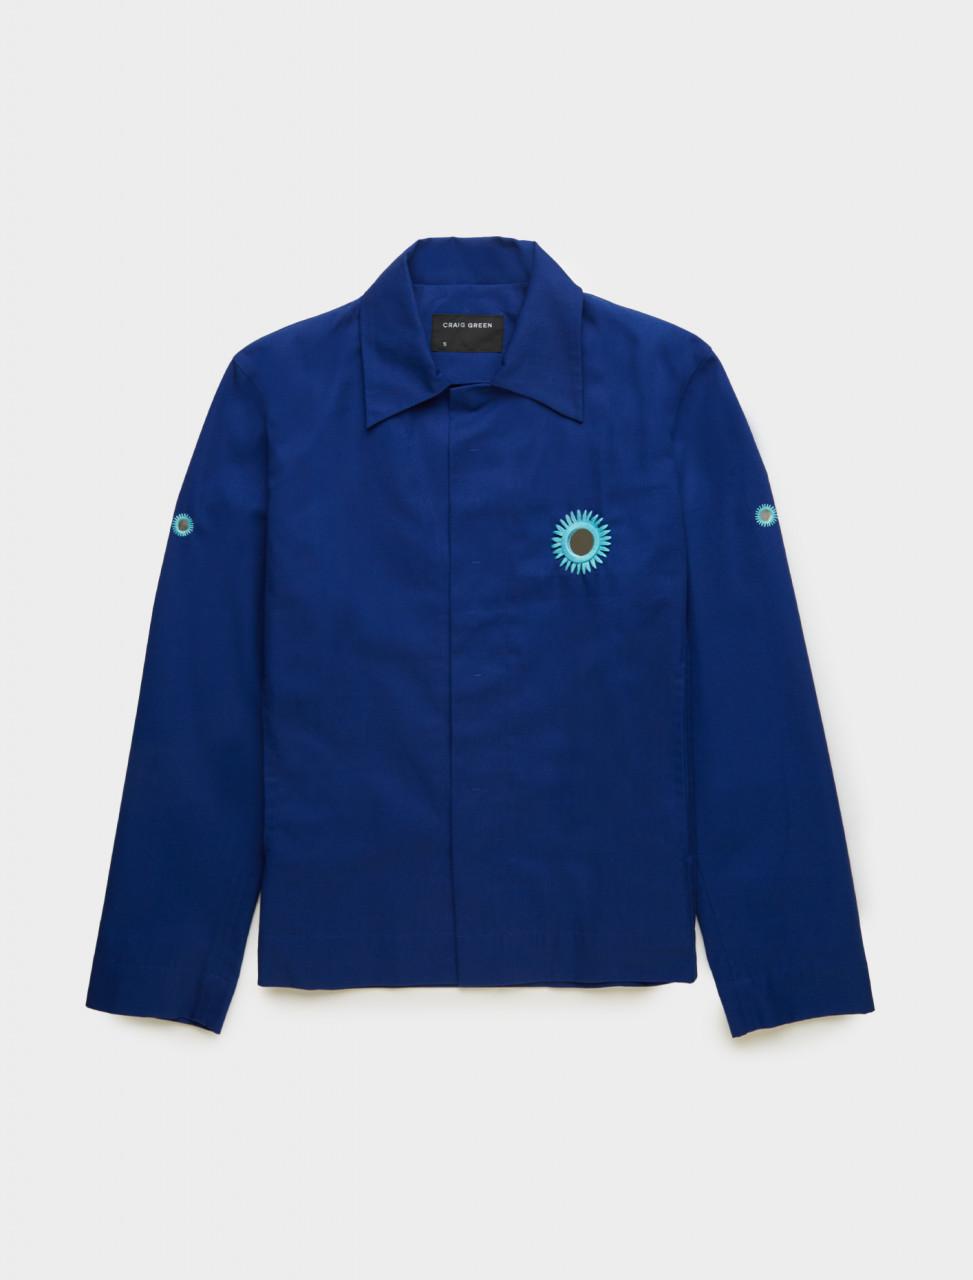 Craig Green Embroidered Mirror Jacket in Blue